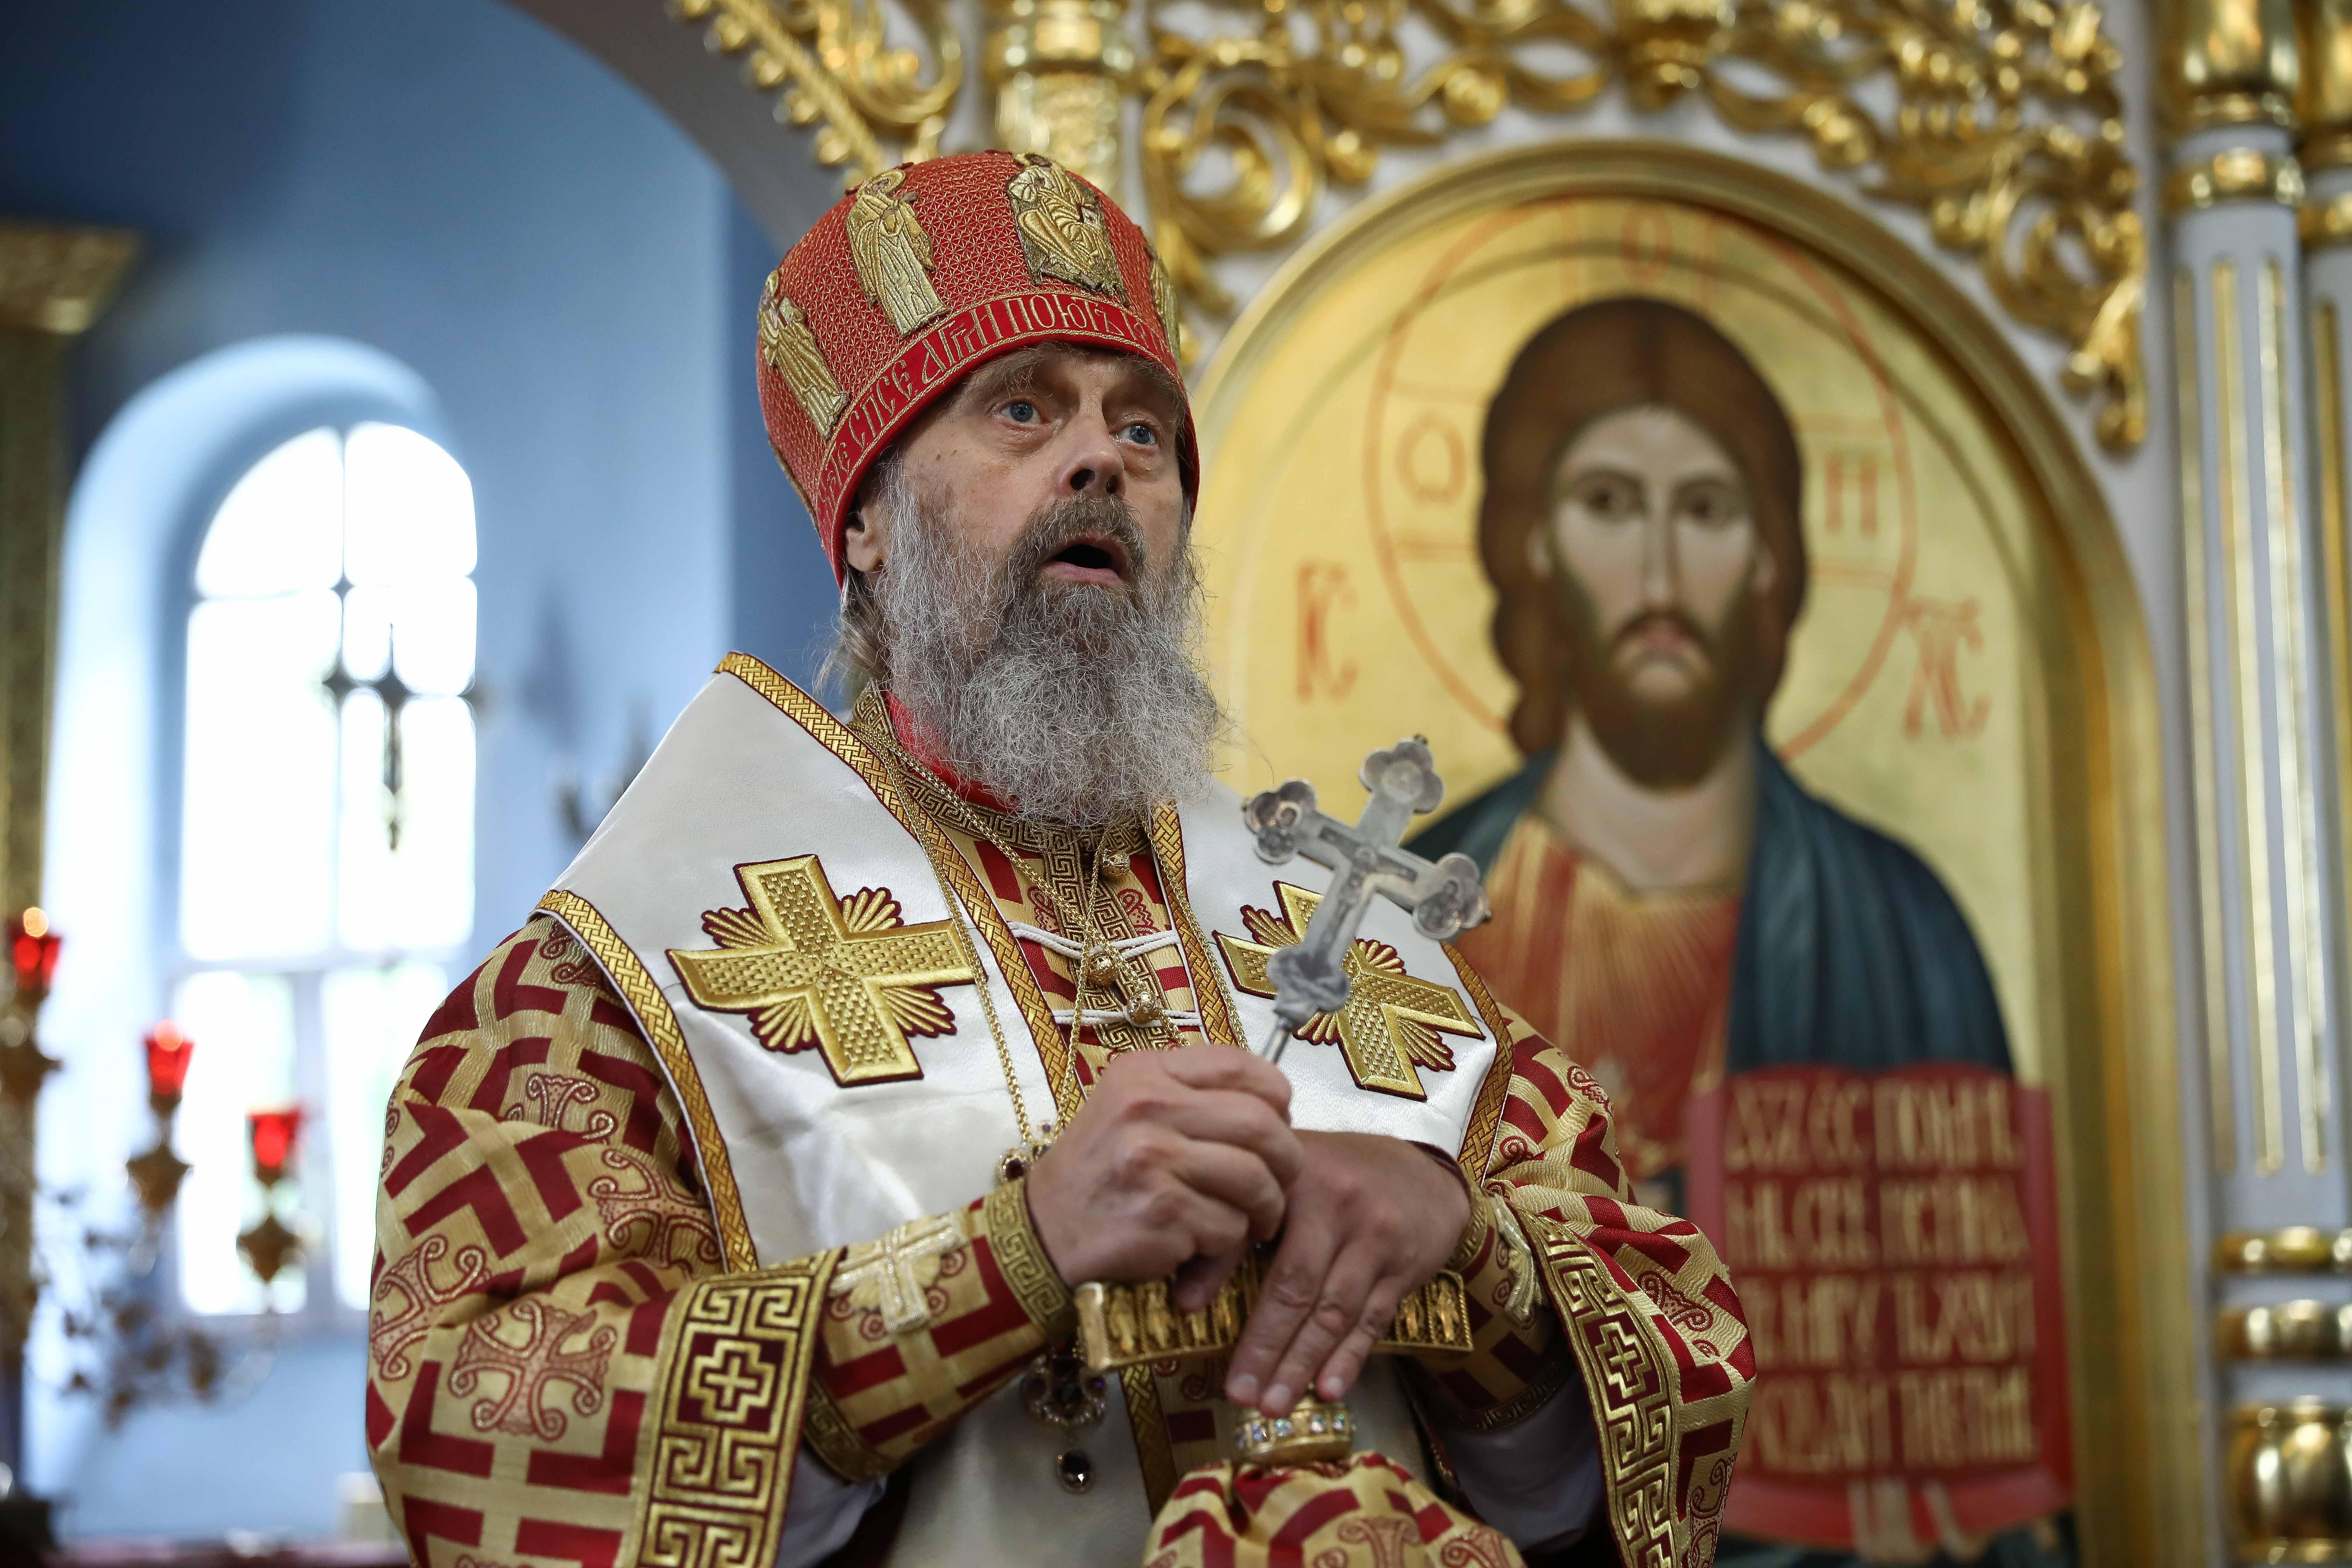 http://monuspen.ru/photoreports/6fe34d0b1744123e0a9091cd842914cd.jpg